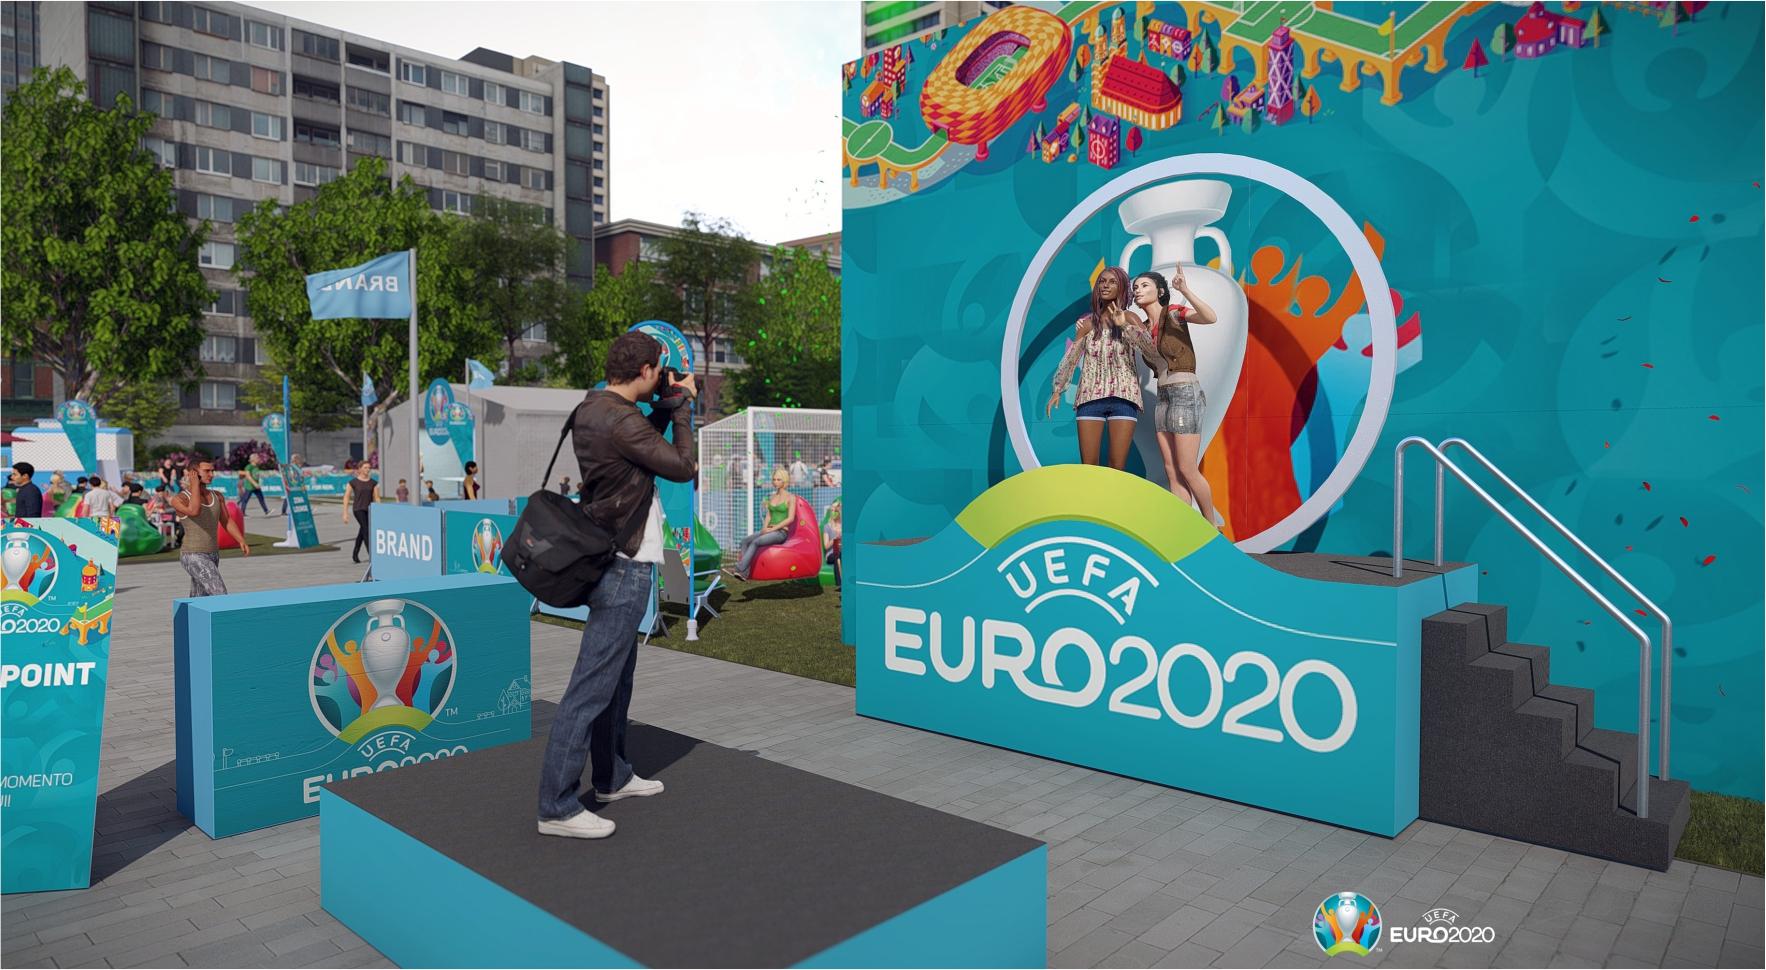 Fun Zone Euro 2020 zona de fotografia do europeu futebol